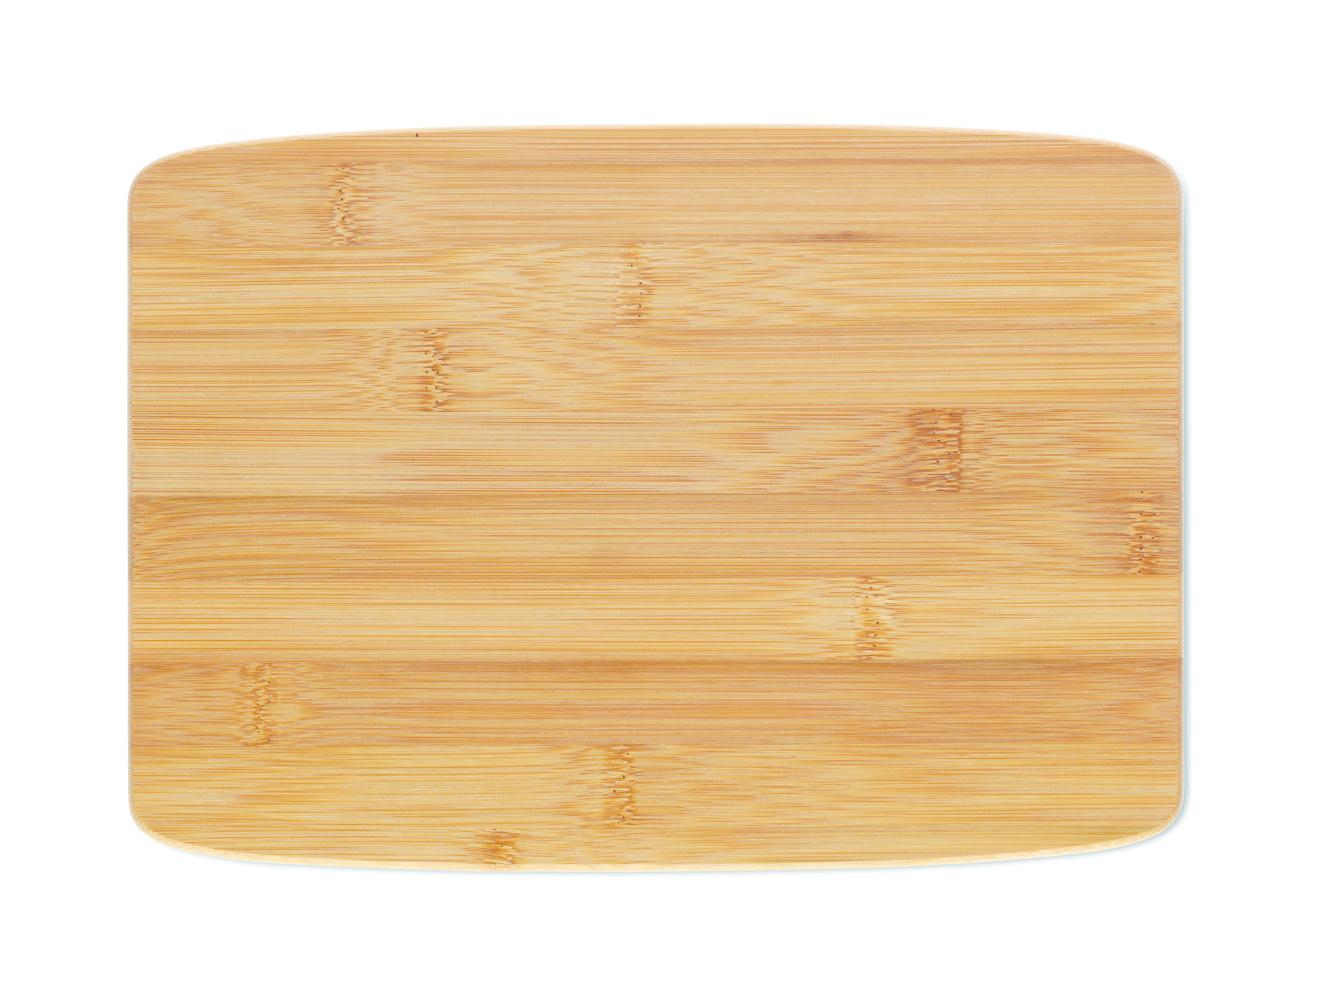 Kela Keuken Katana Snijplank